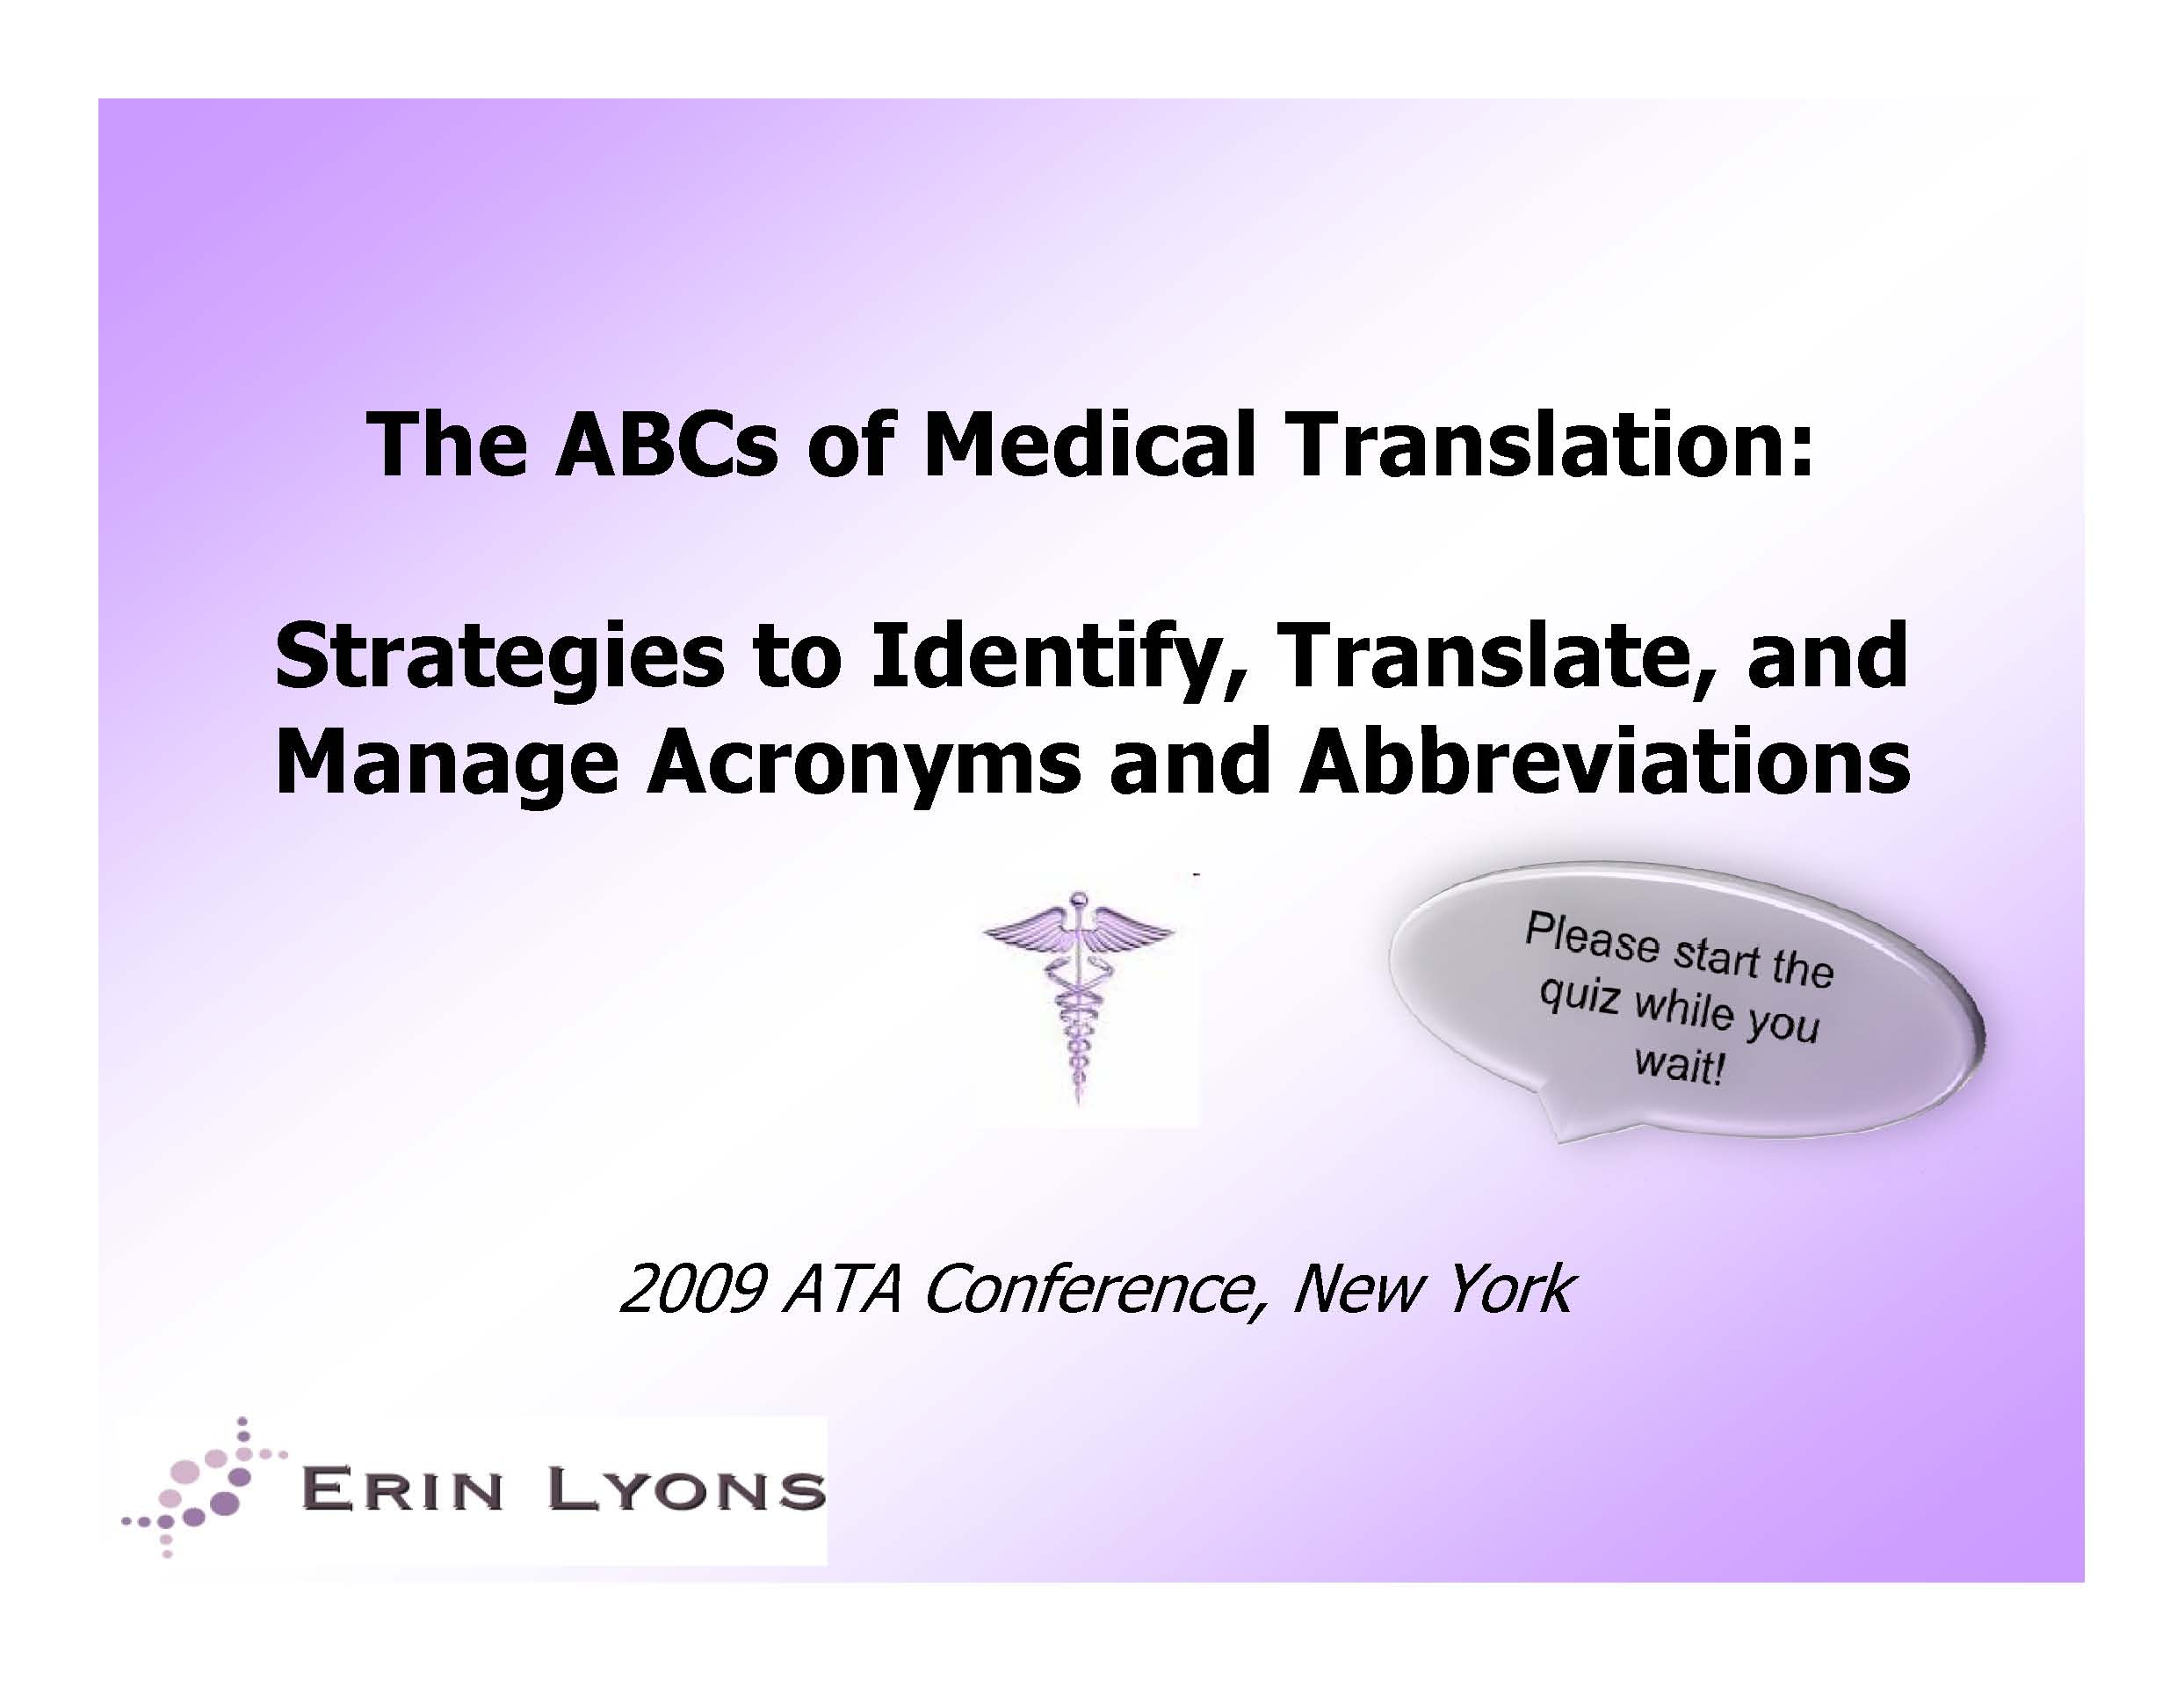 2009 ATA Conference